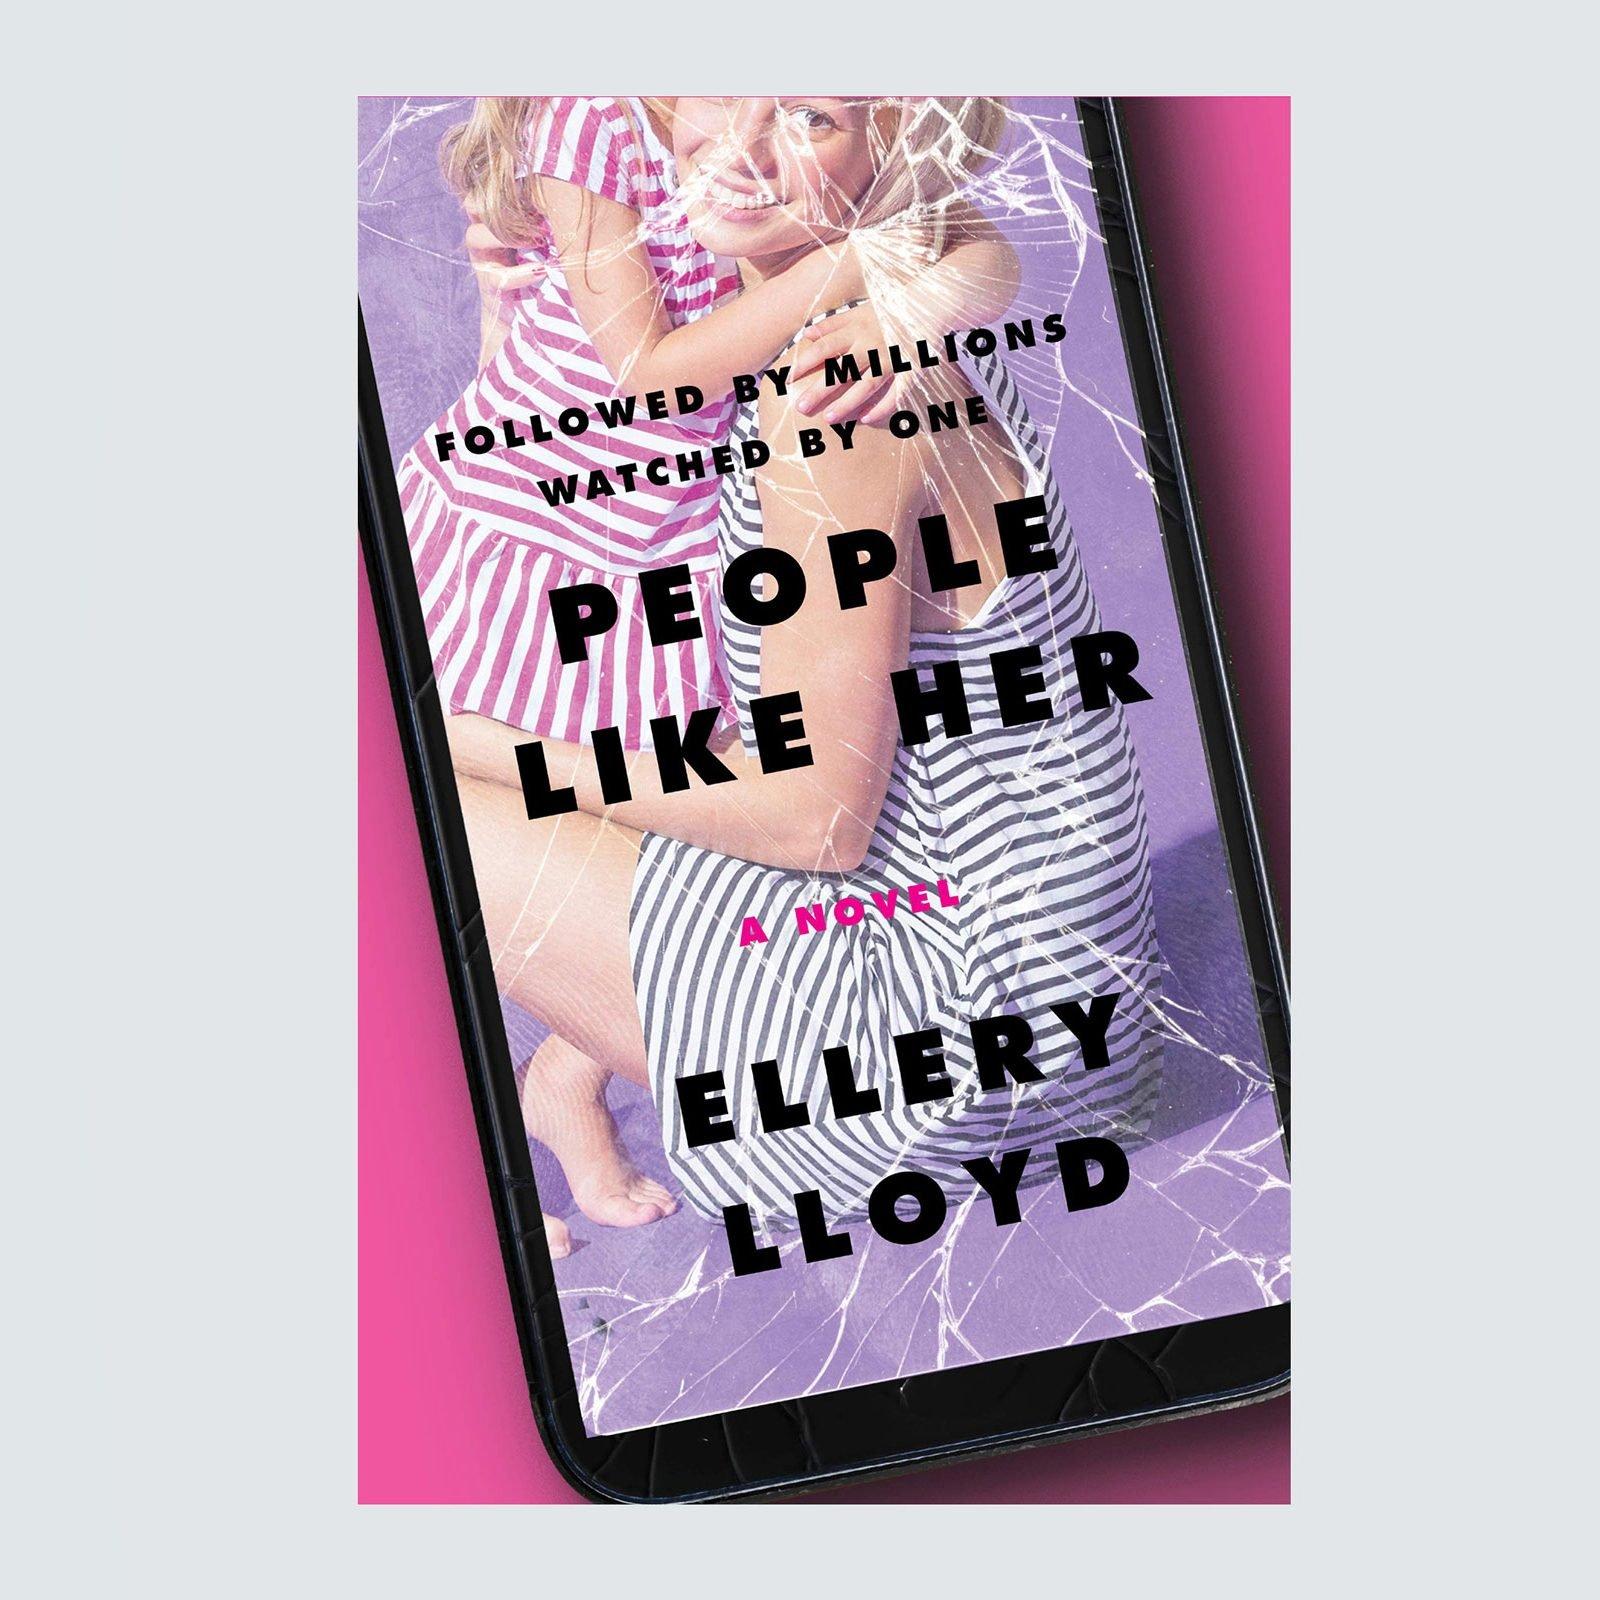 People Like Her by Ellery Lloyd